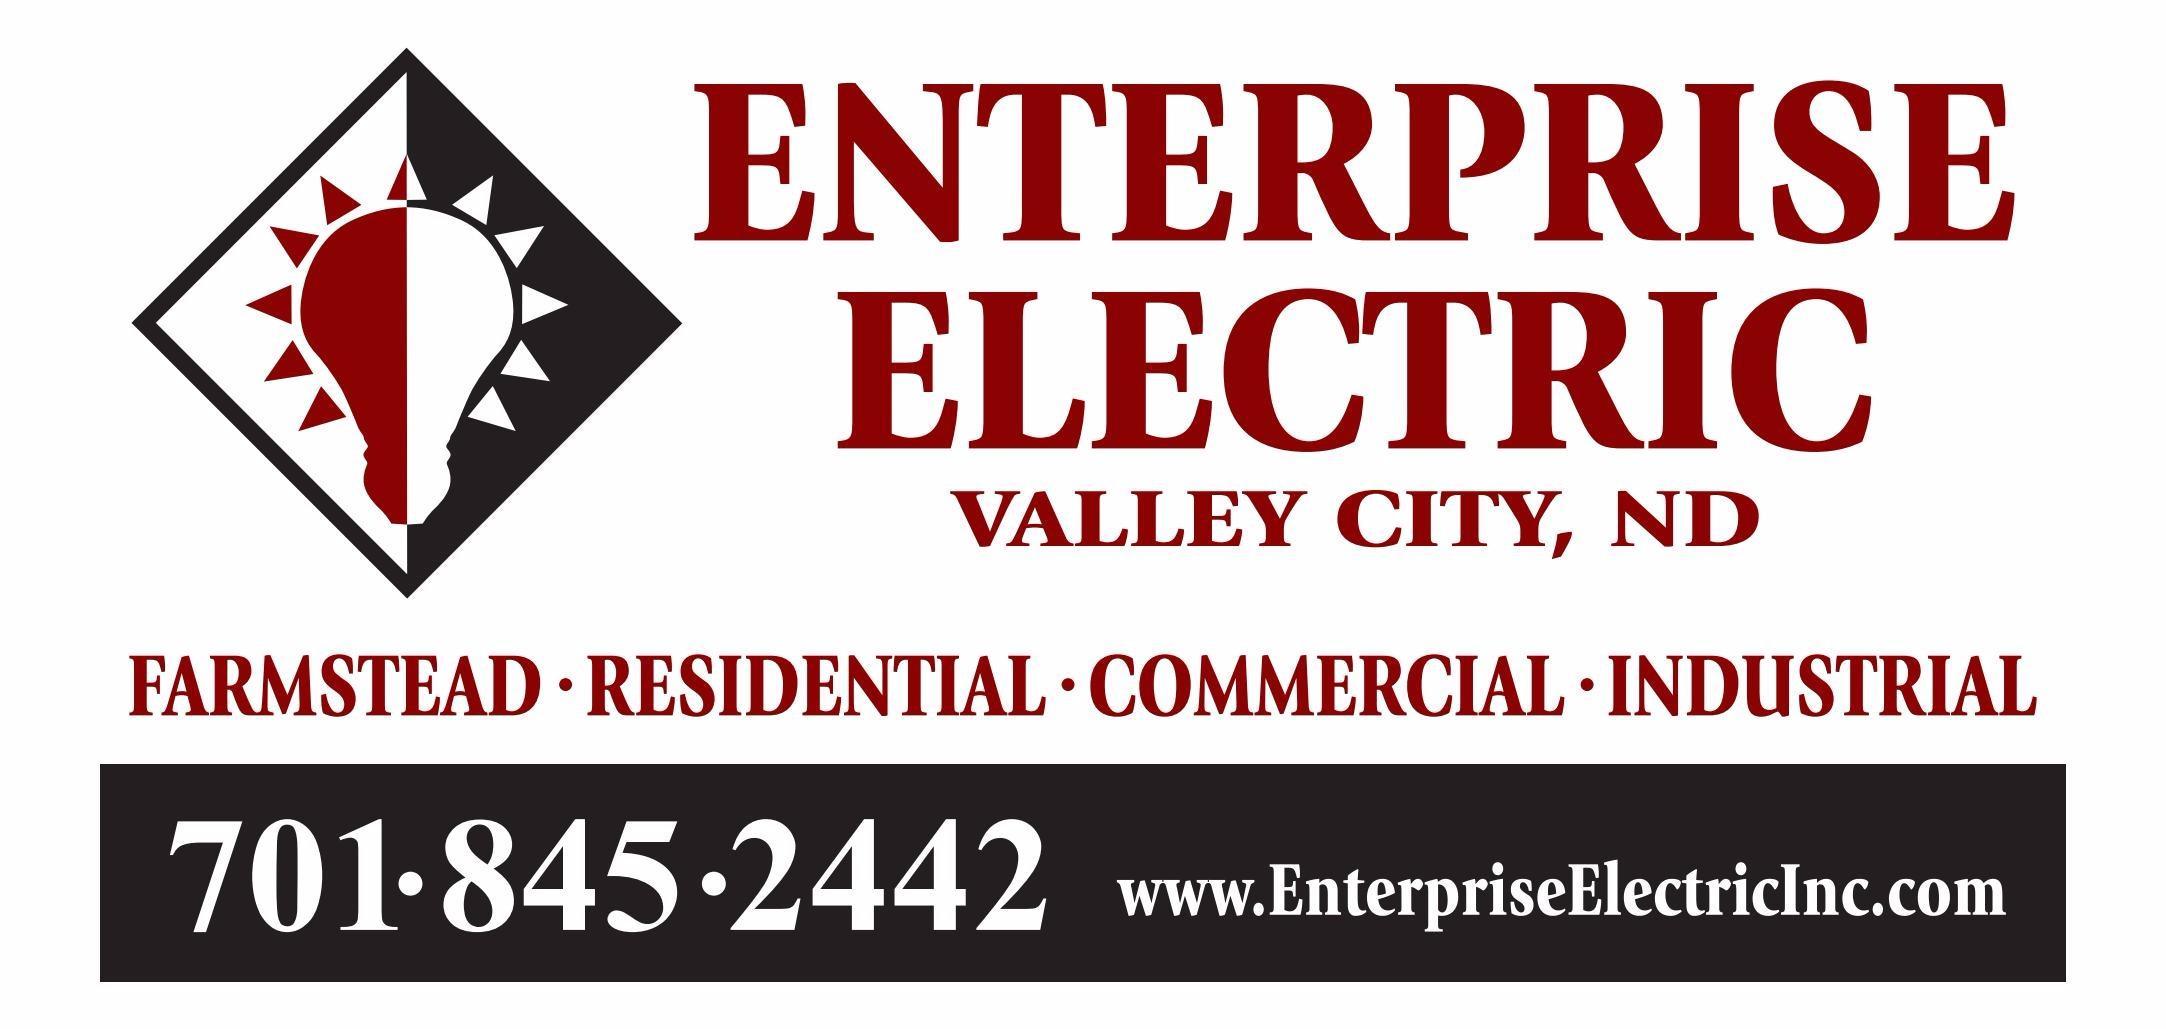 Enterprise Electric Inc image 1